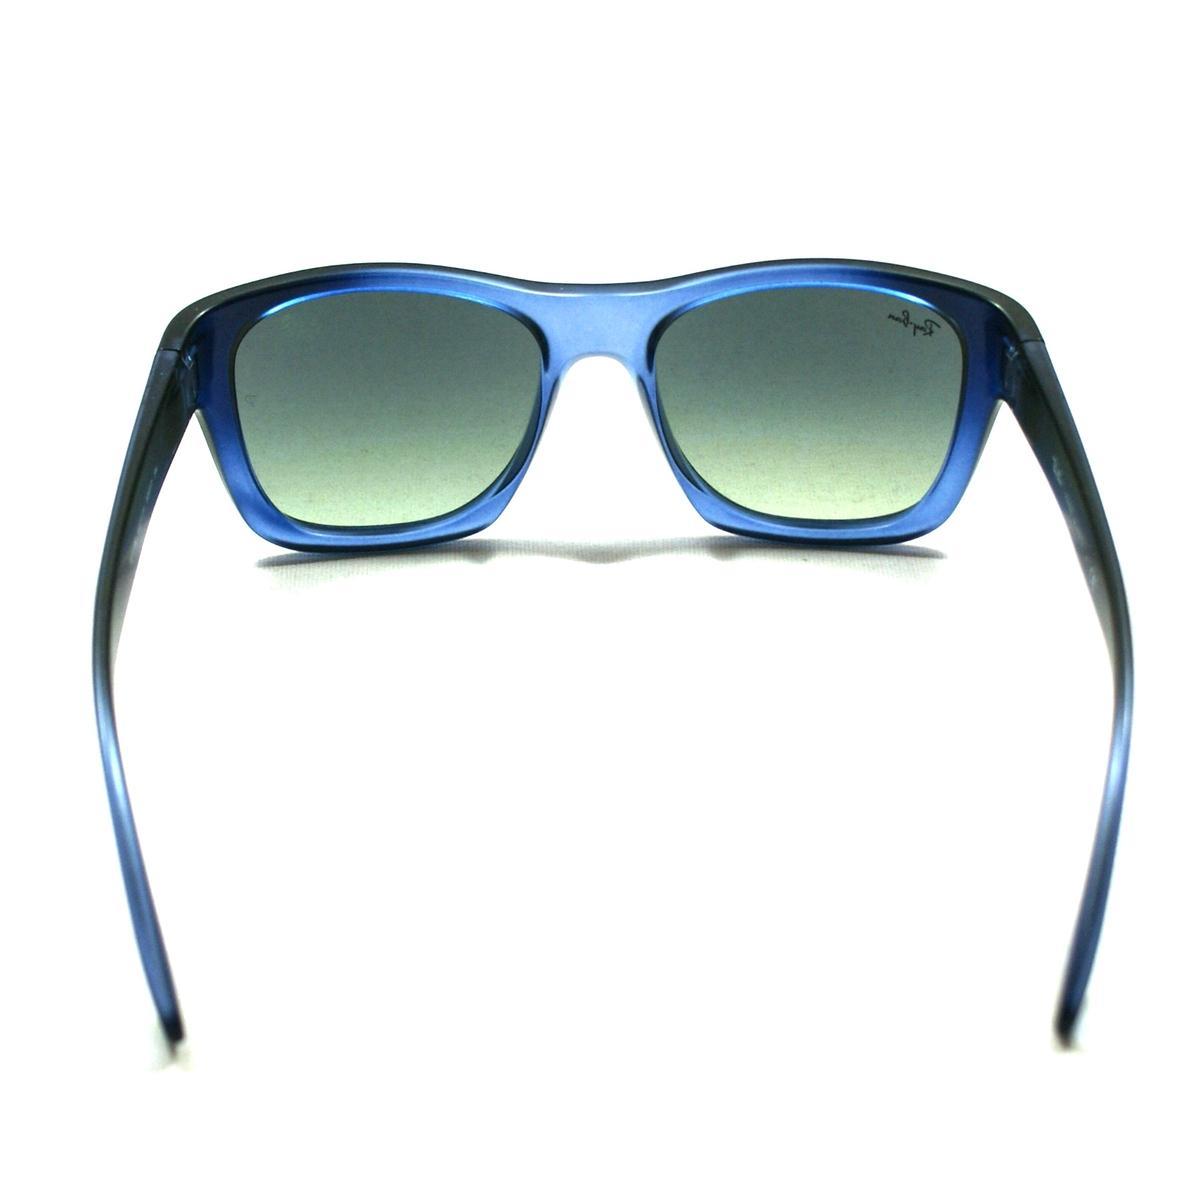 blue raybans 1ln0  baby blue ray bans glasses